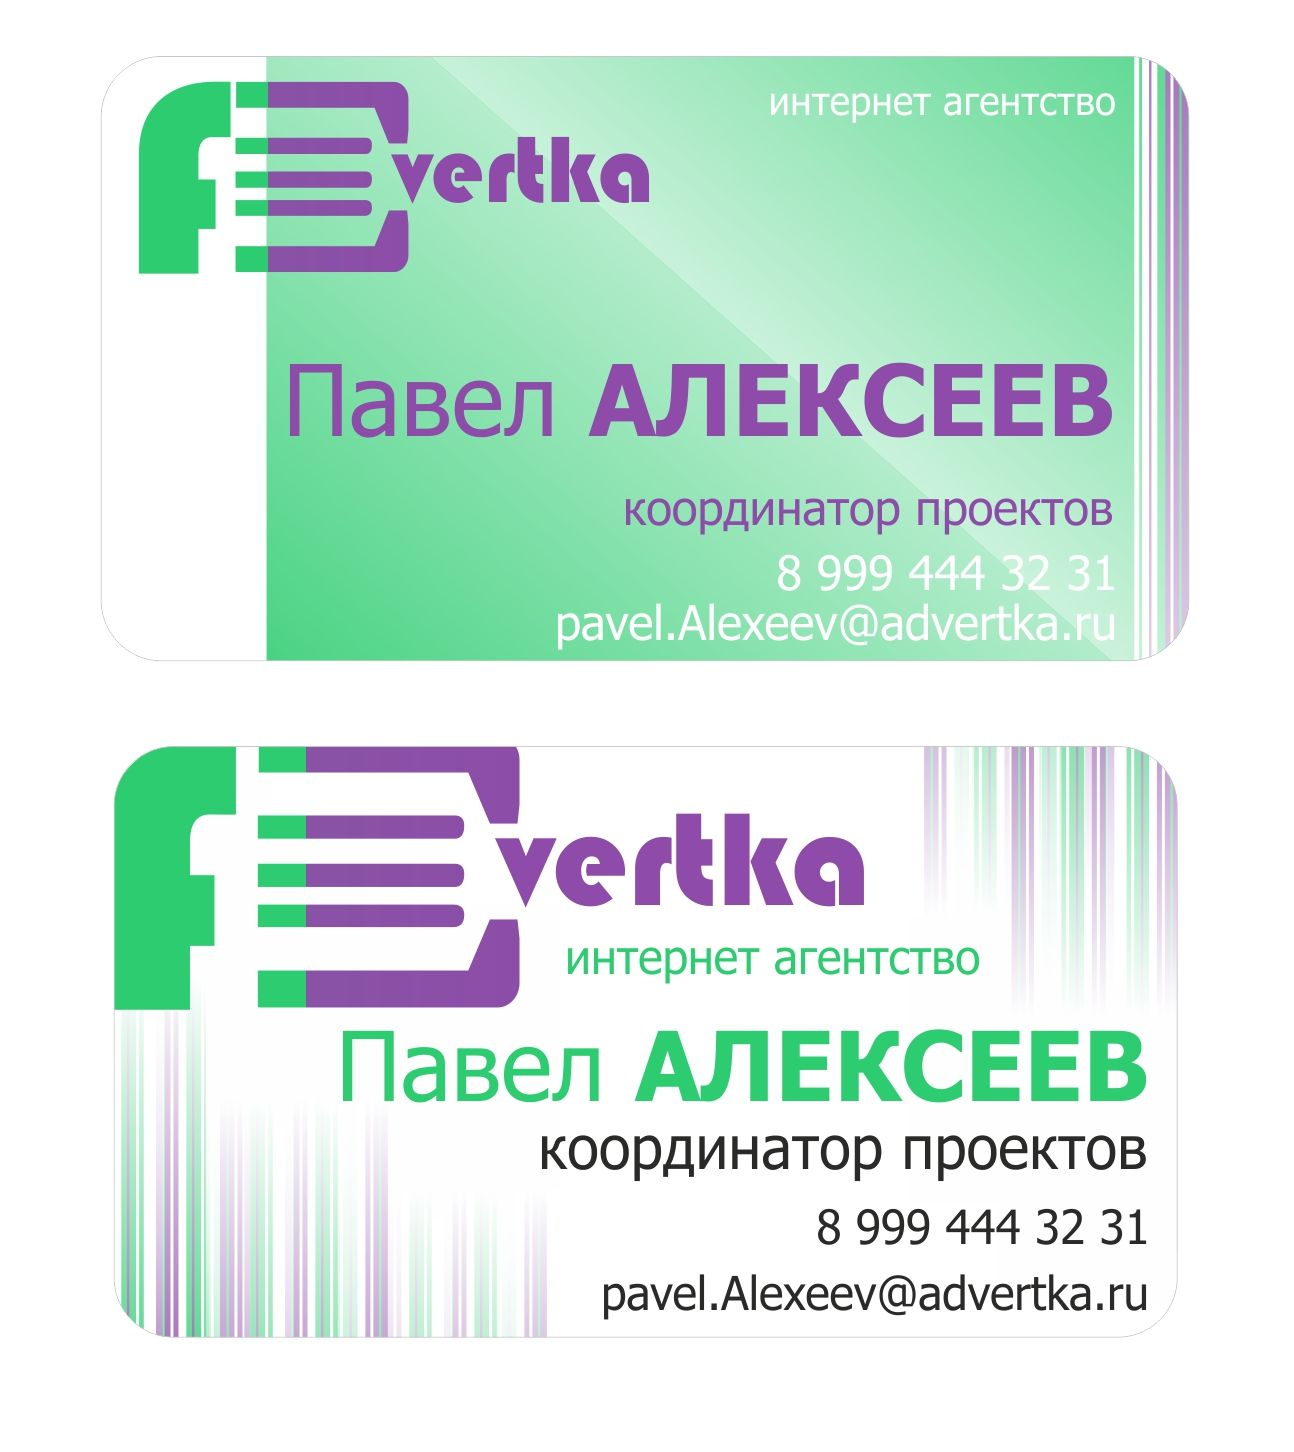 логотип для интернет агентства ADvertka - дизайнер dizkonenter